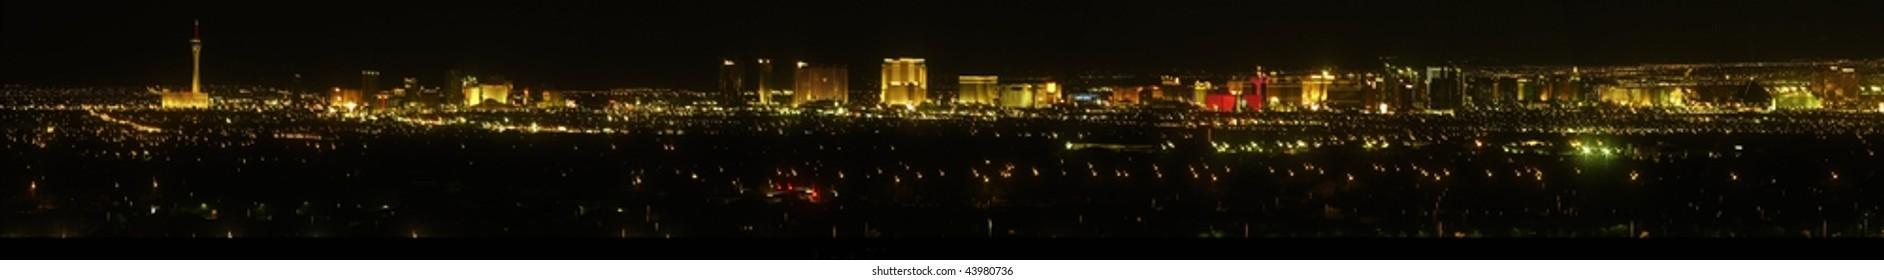 Panoramic photo of Las Vegas in 2008 at night.